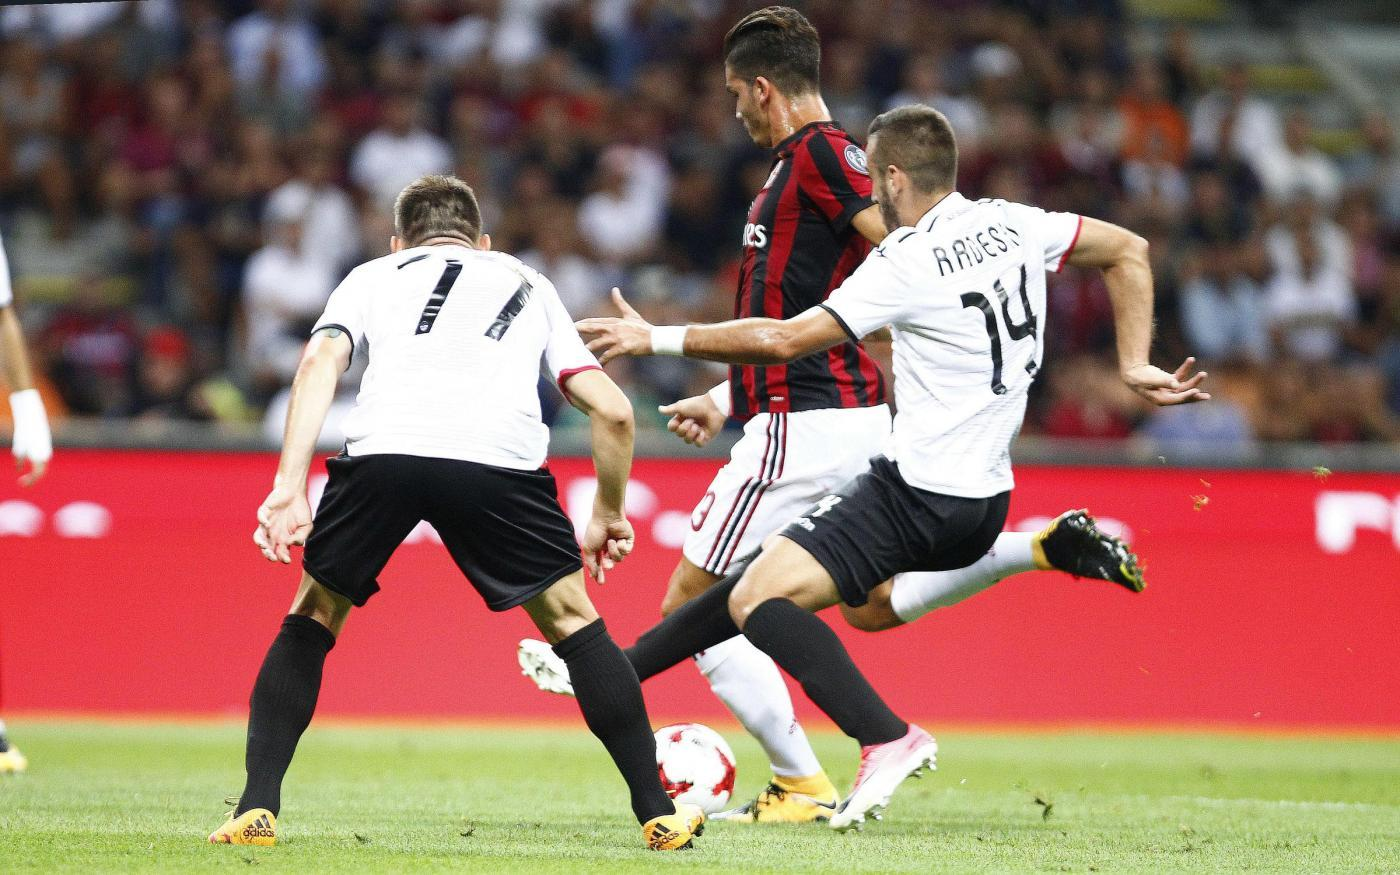 Europa League, Milan-Shkëndija 6-0